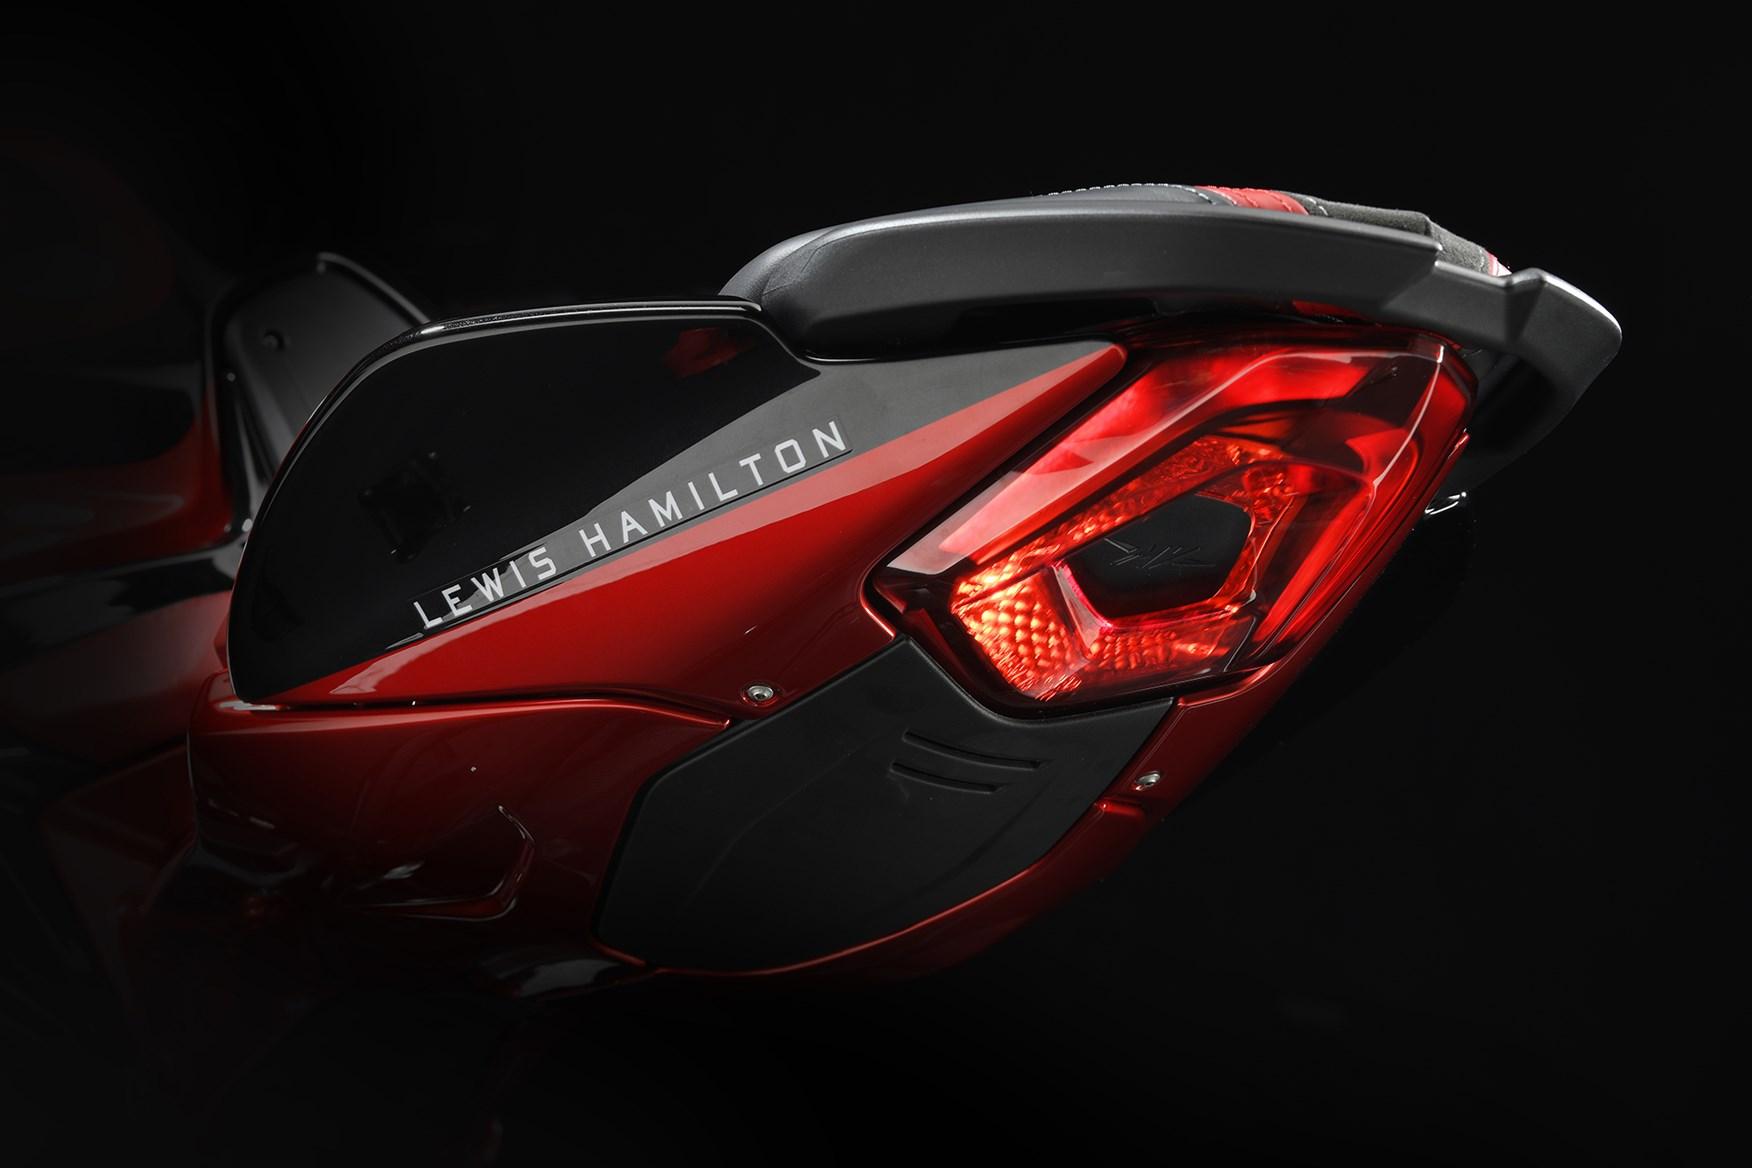 MV Agusta Brutale 800 RR Lewis Hamilton Edition (6)